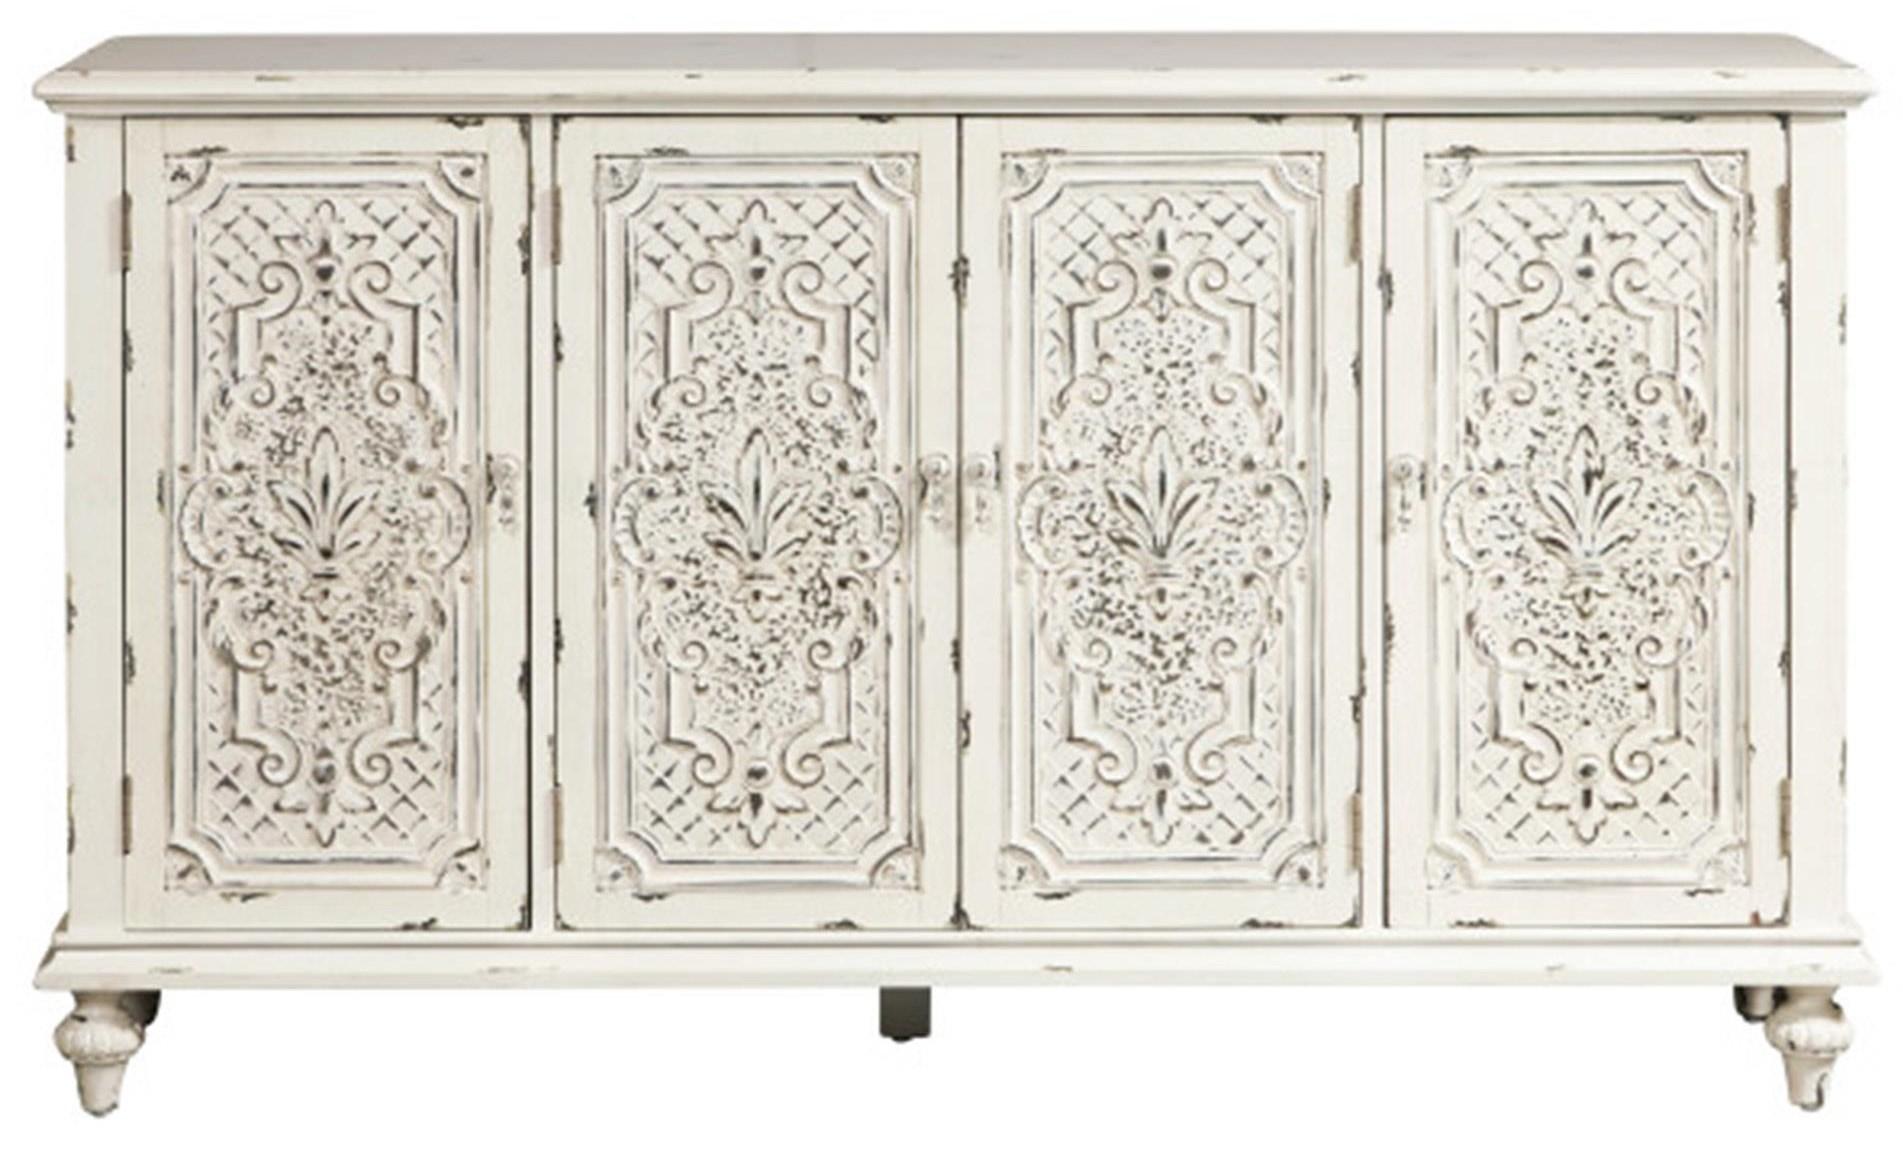 Pulaski Furniture Accents Ornate 4 Door Credenza - Item Number: D212-104